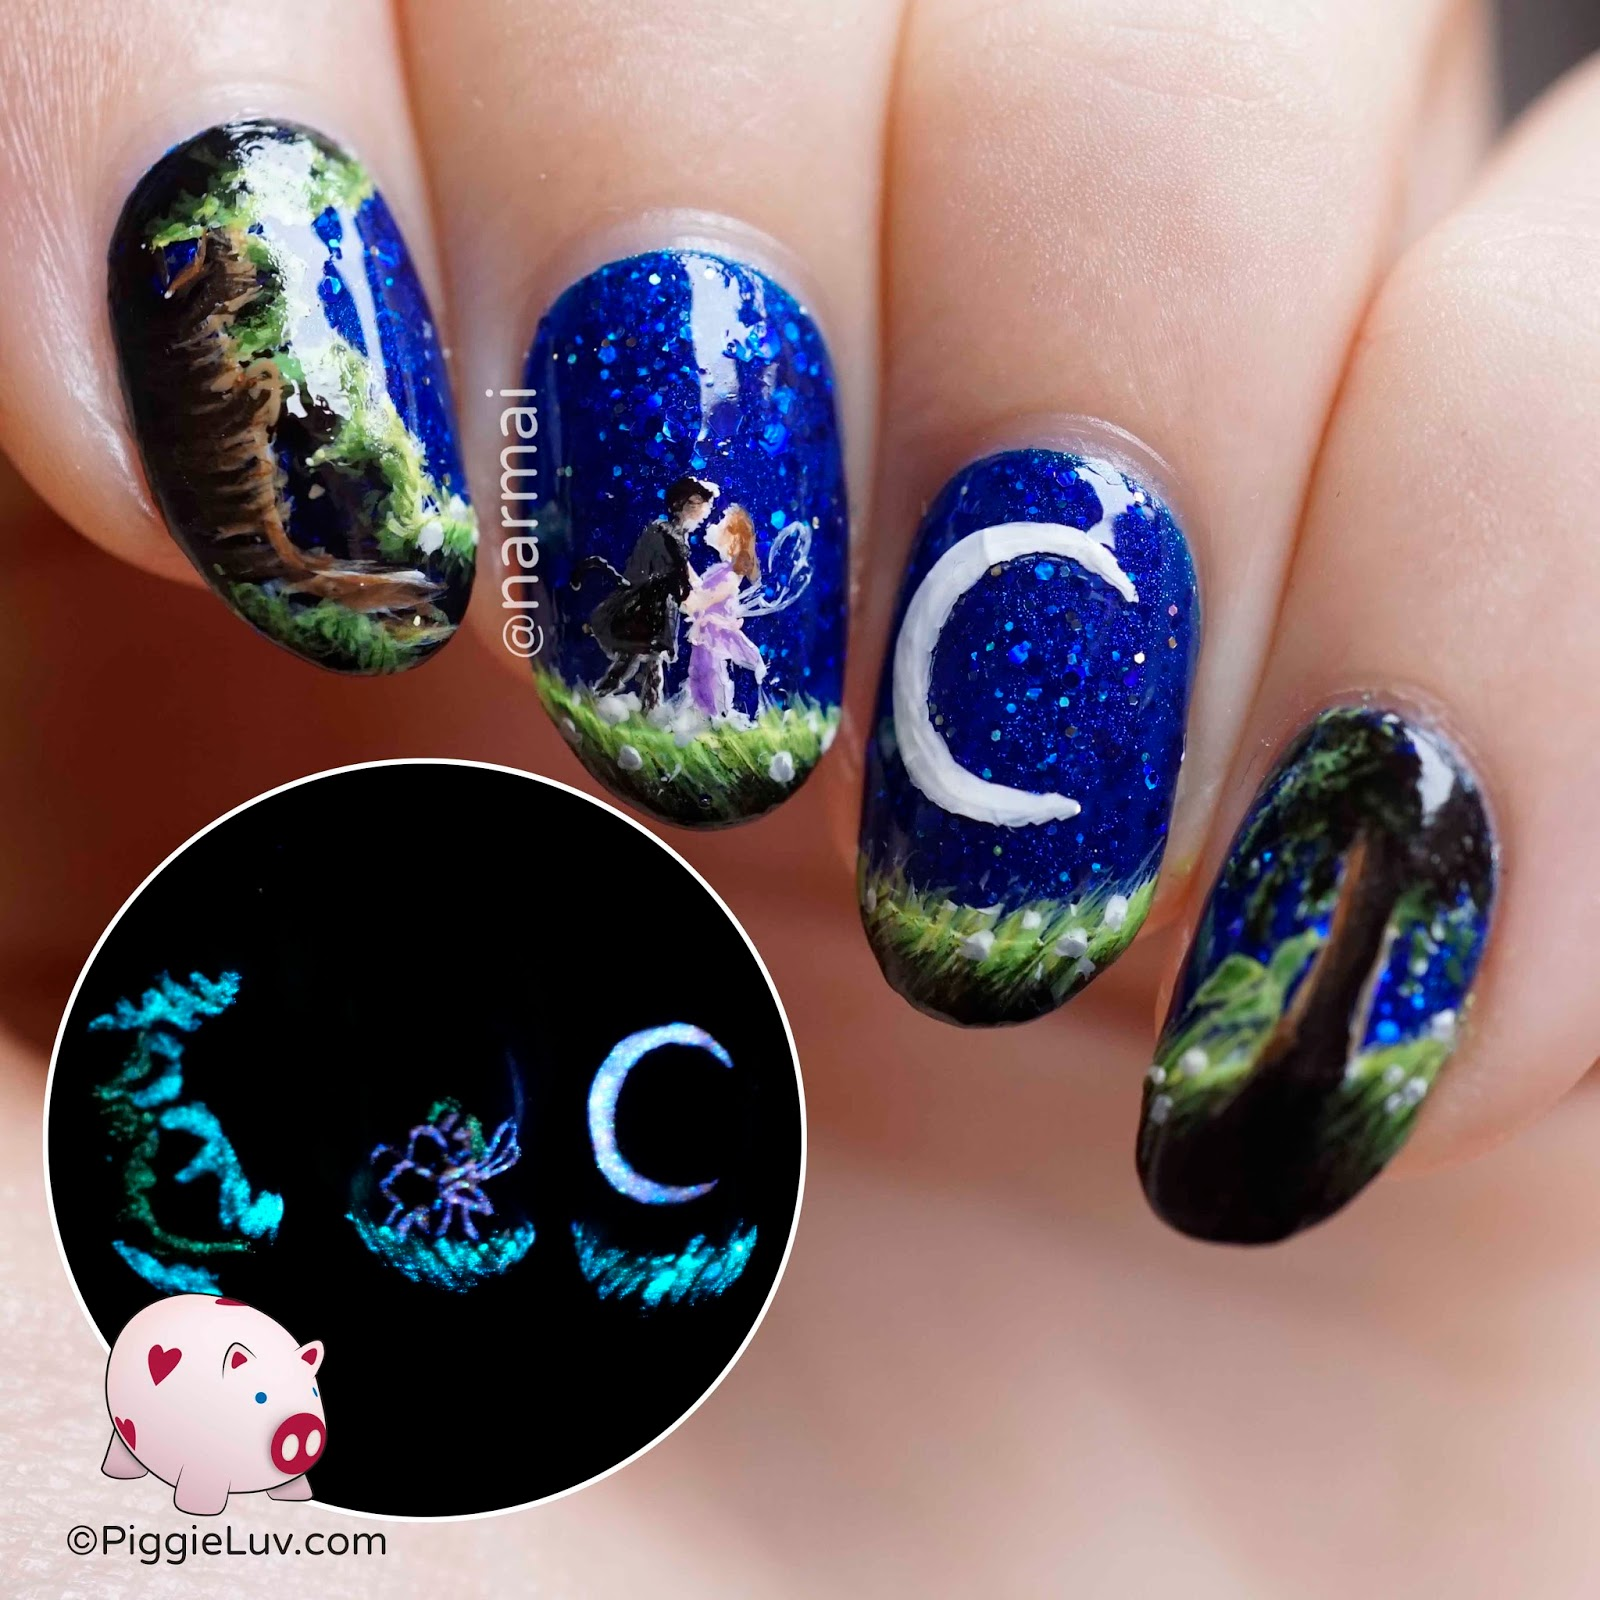 Piggieluv Fairy Love Nail Art Glow In The Dark